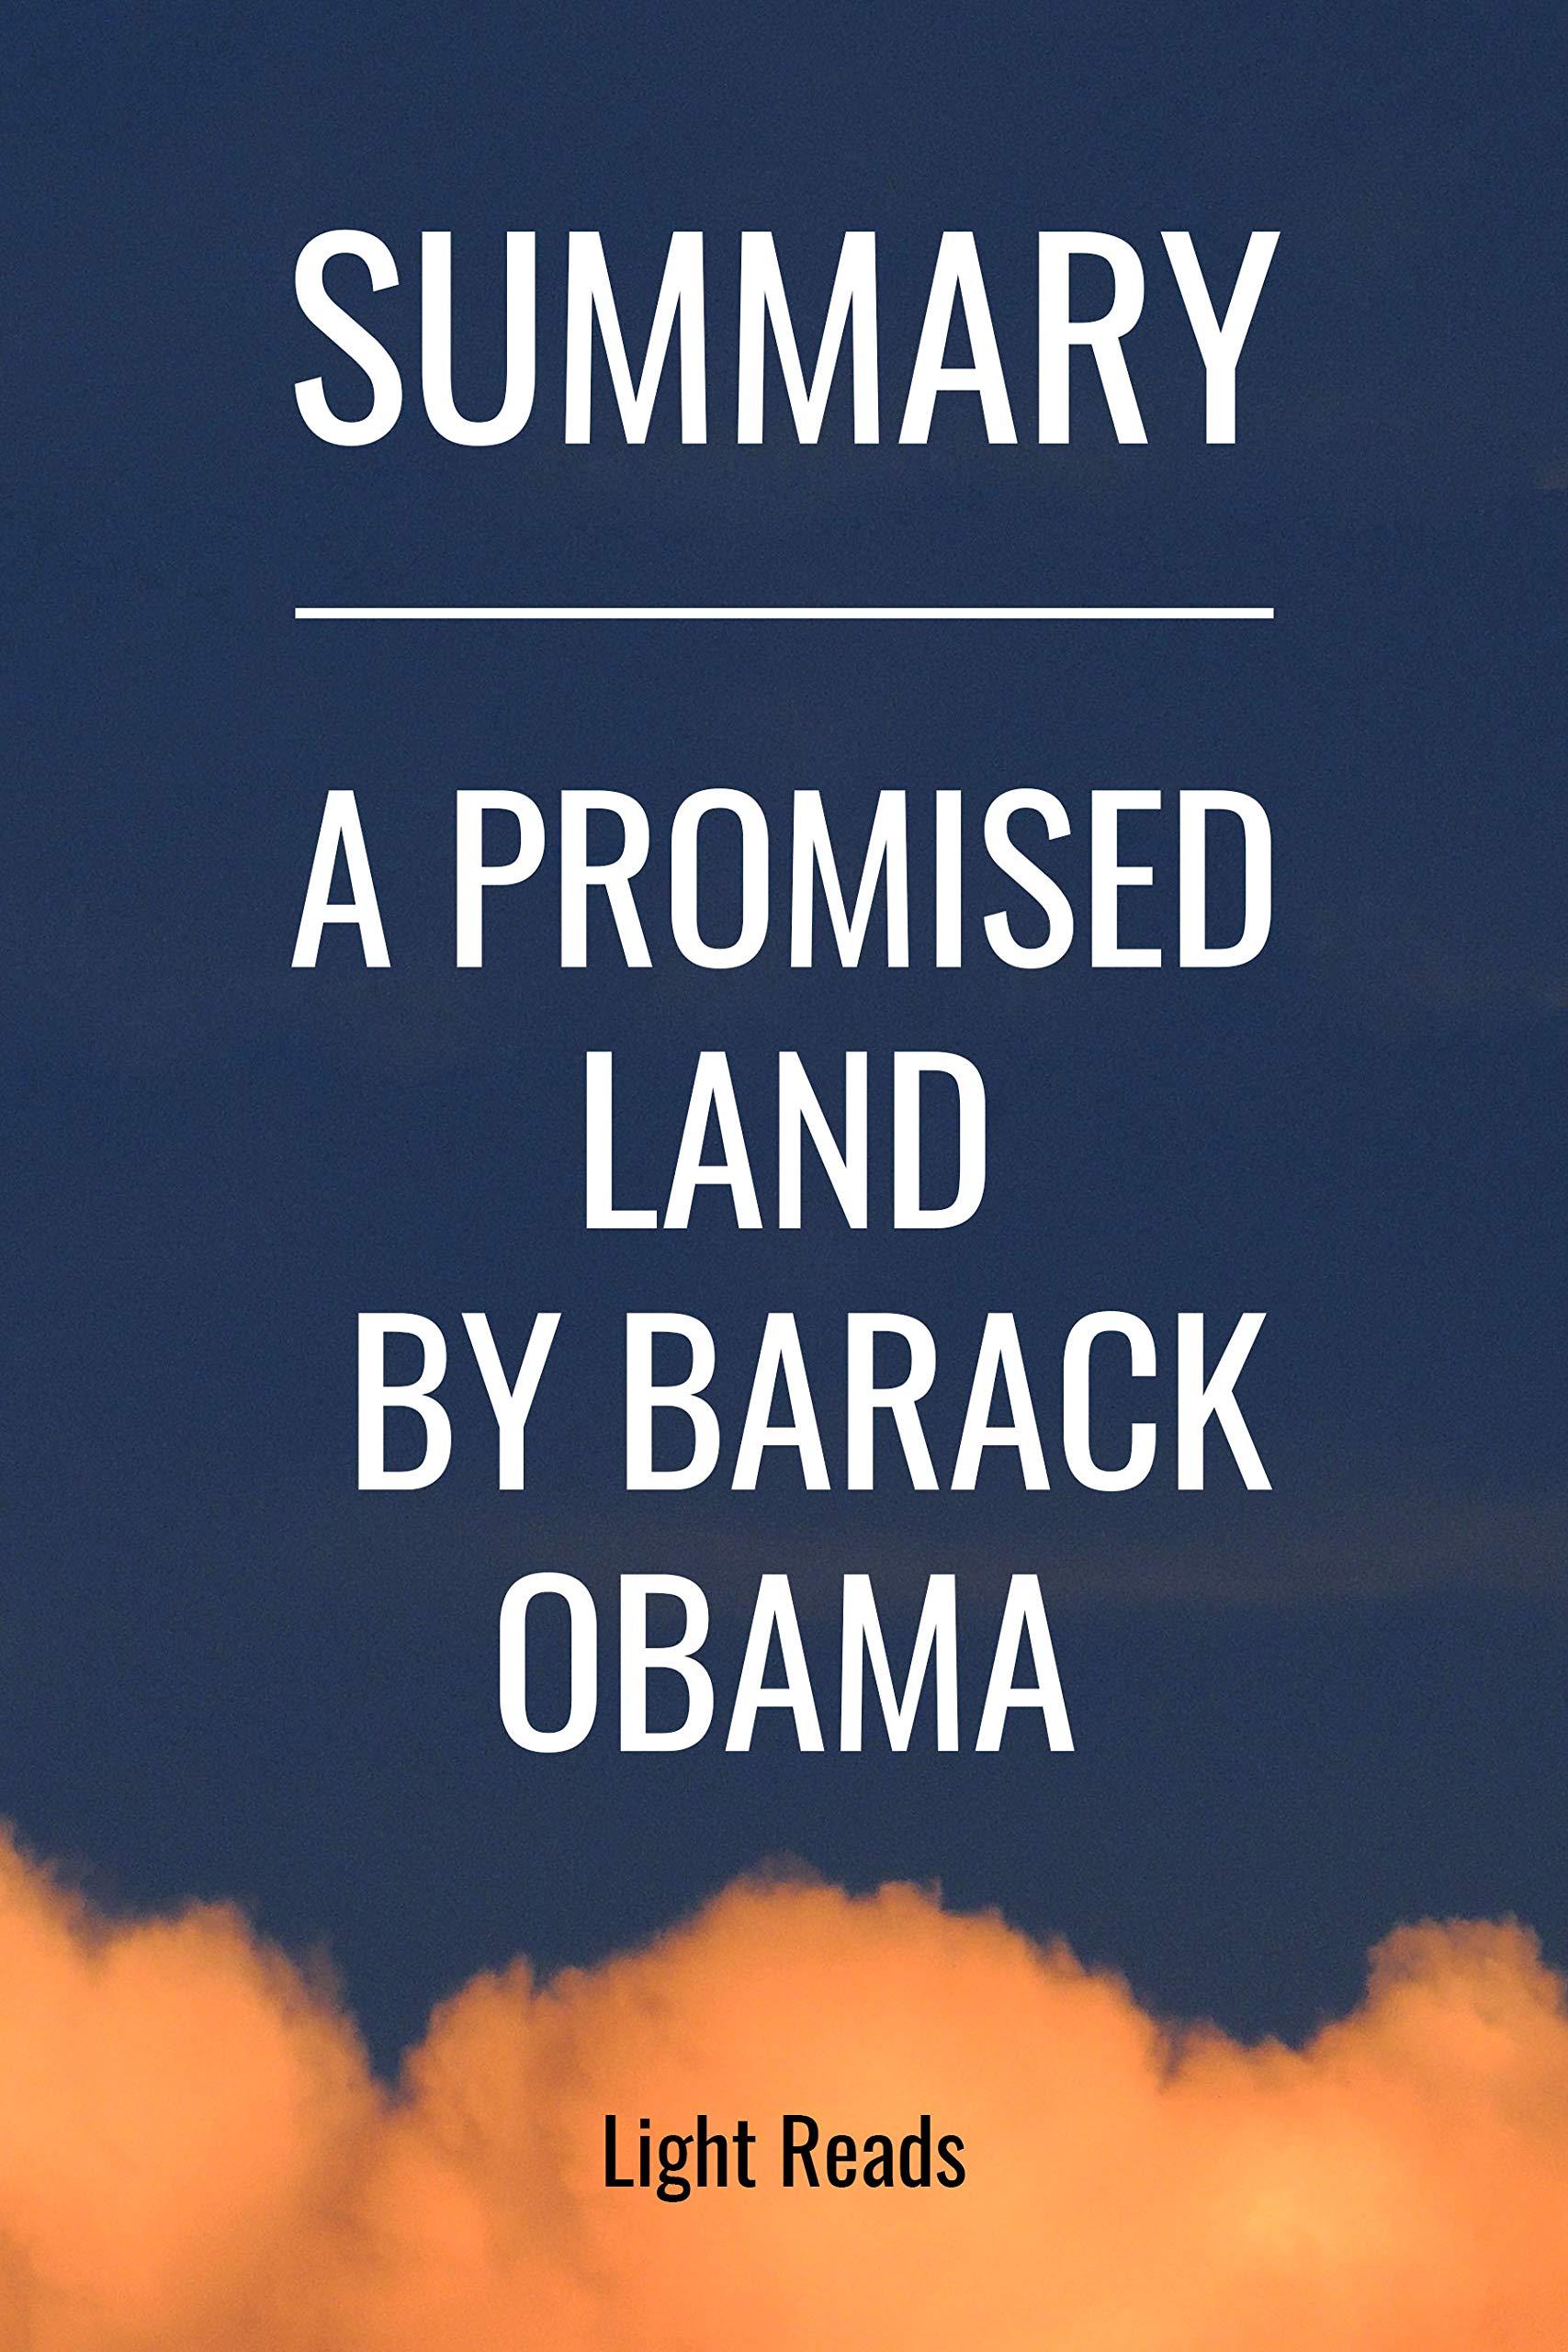 Summary: A Promised Land by Barack Obama